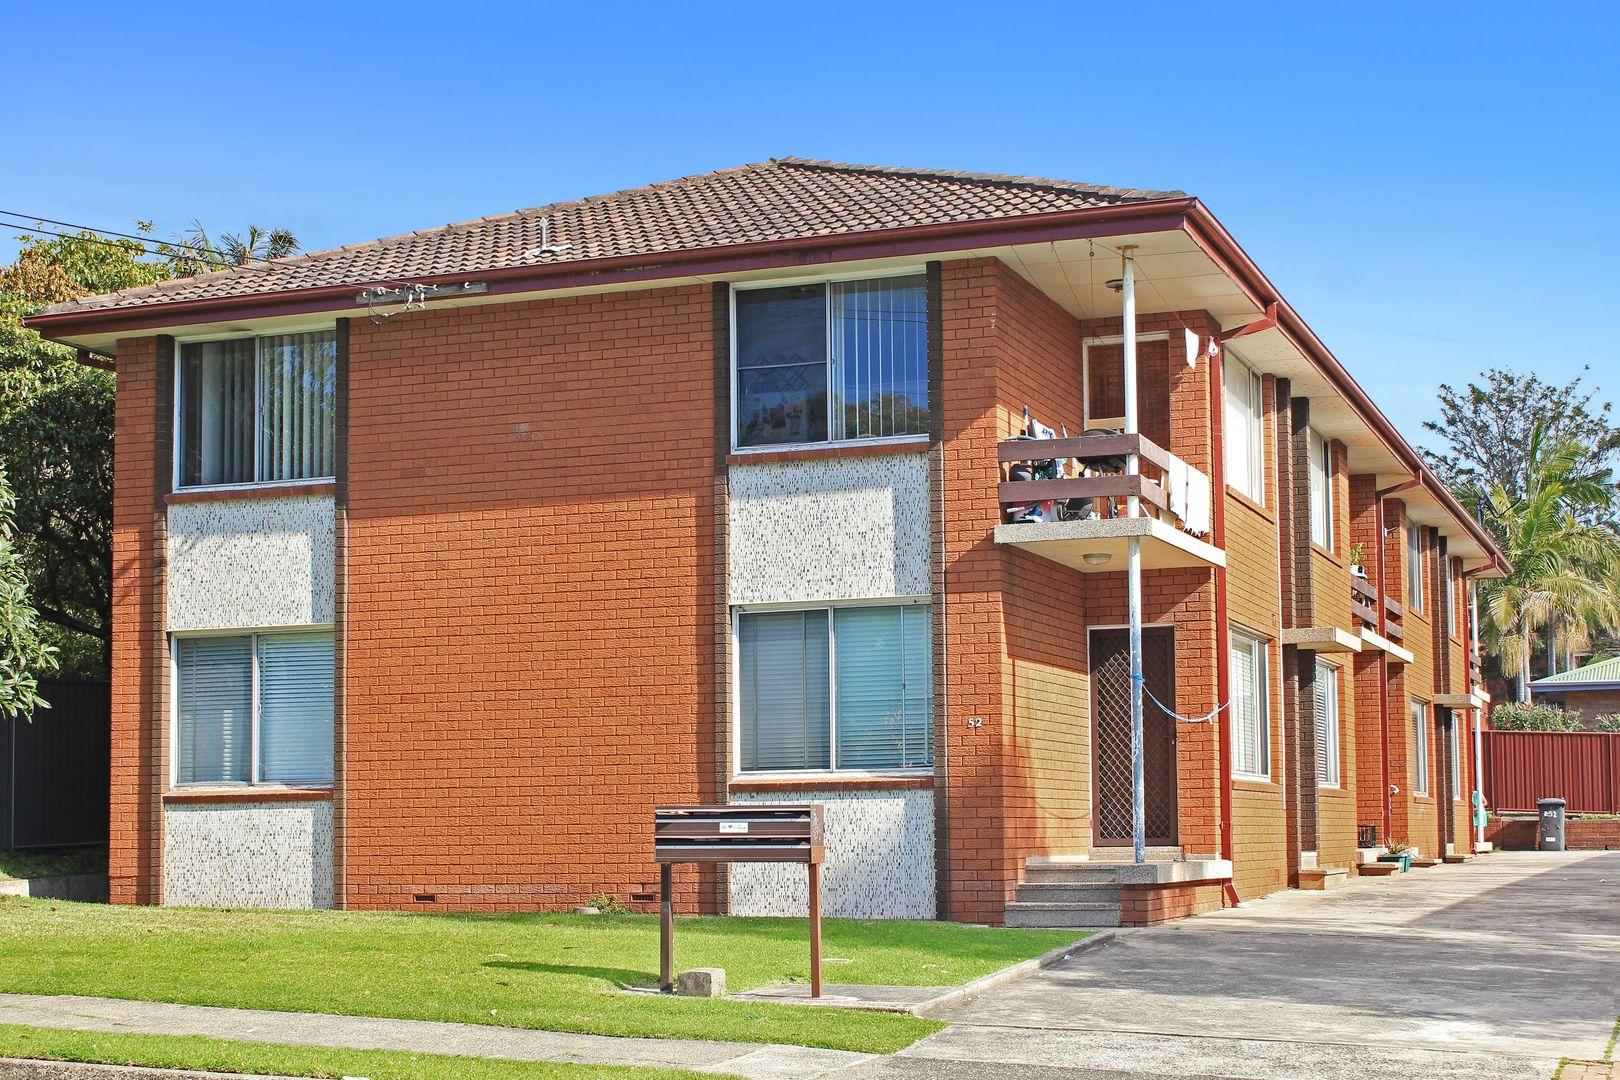 7/52 Kembla  Street, Wollongong NSW 2500, Image 0